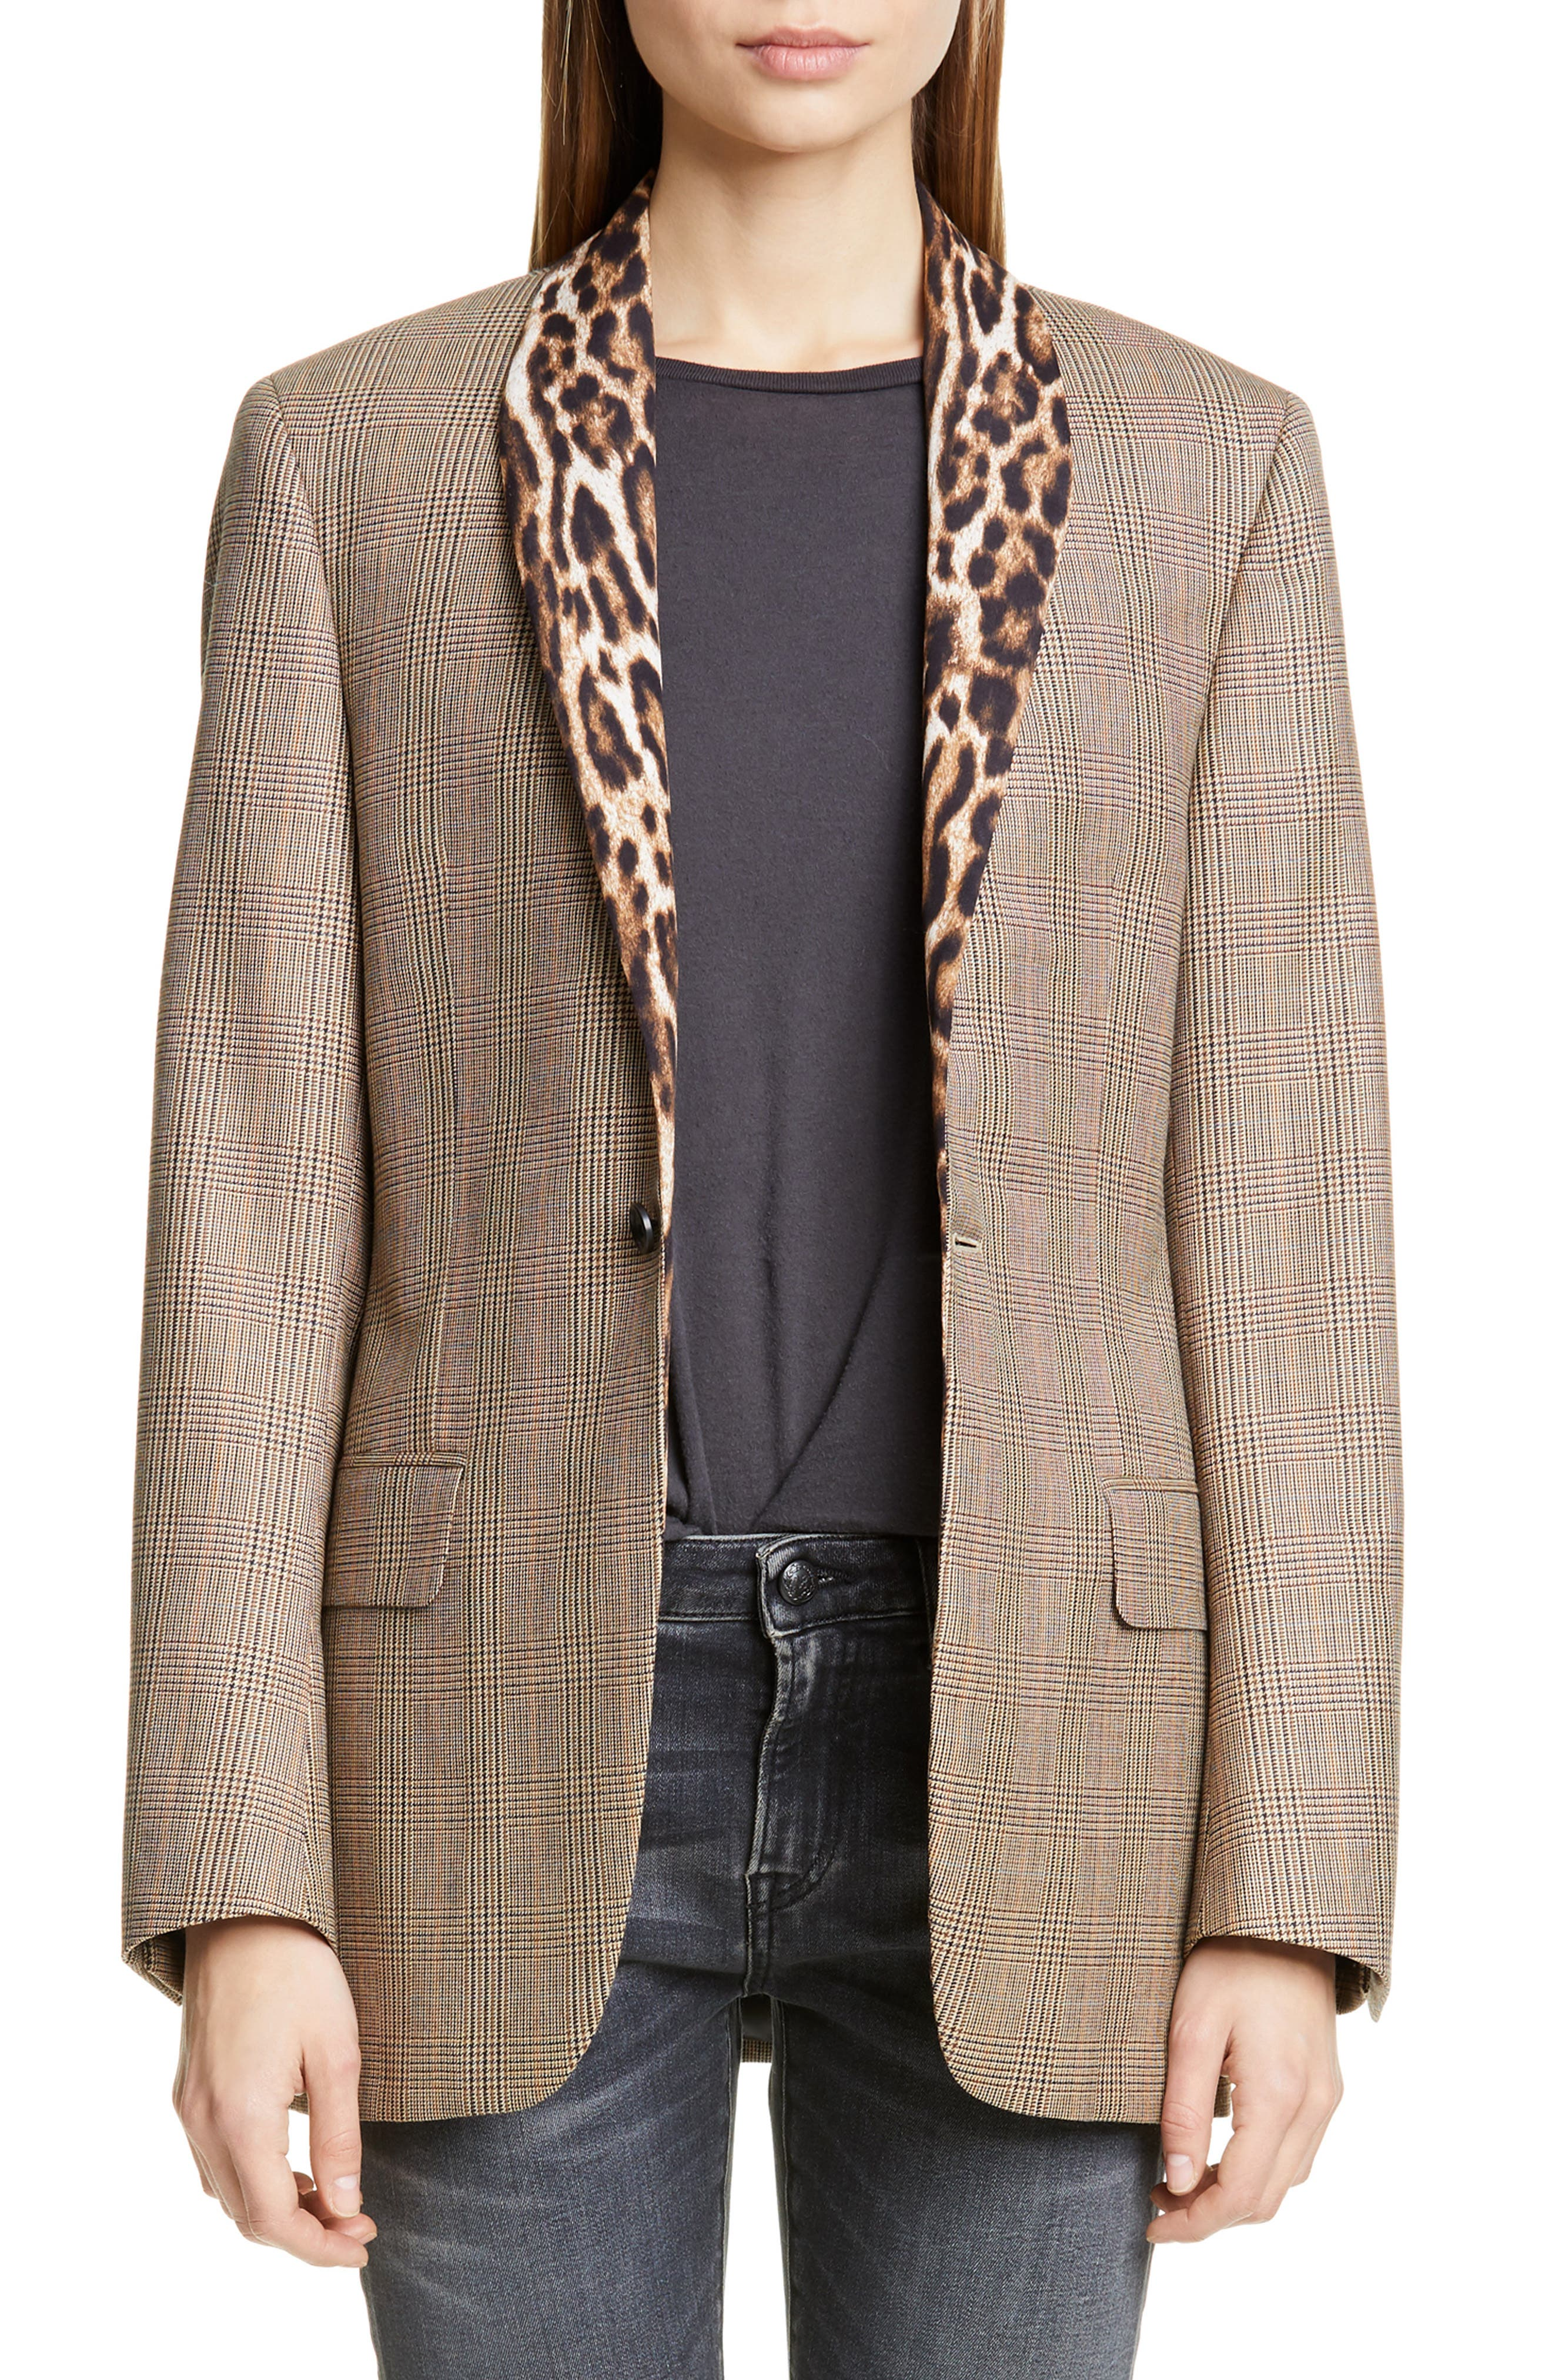 R13 Coats Mixed Print Shawl Collar Jacket